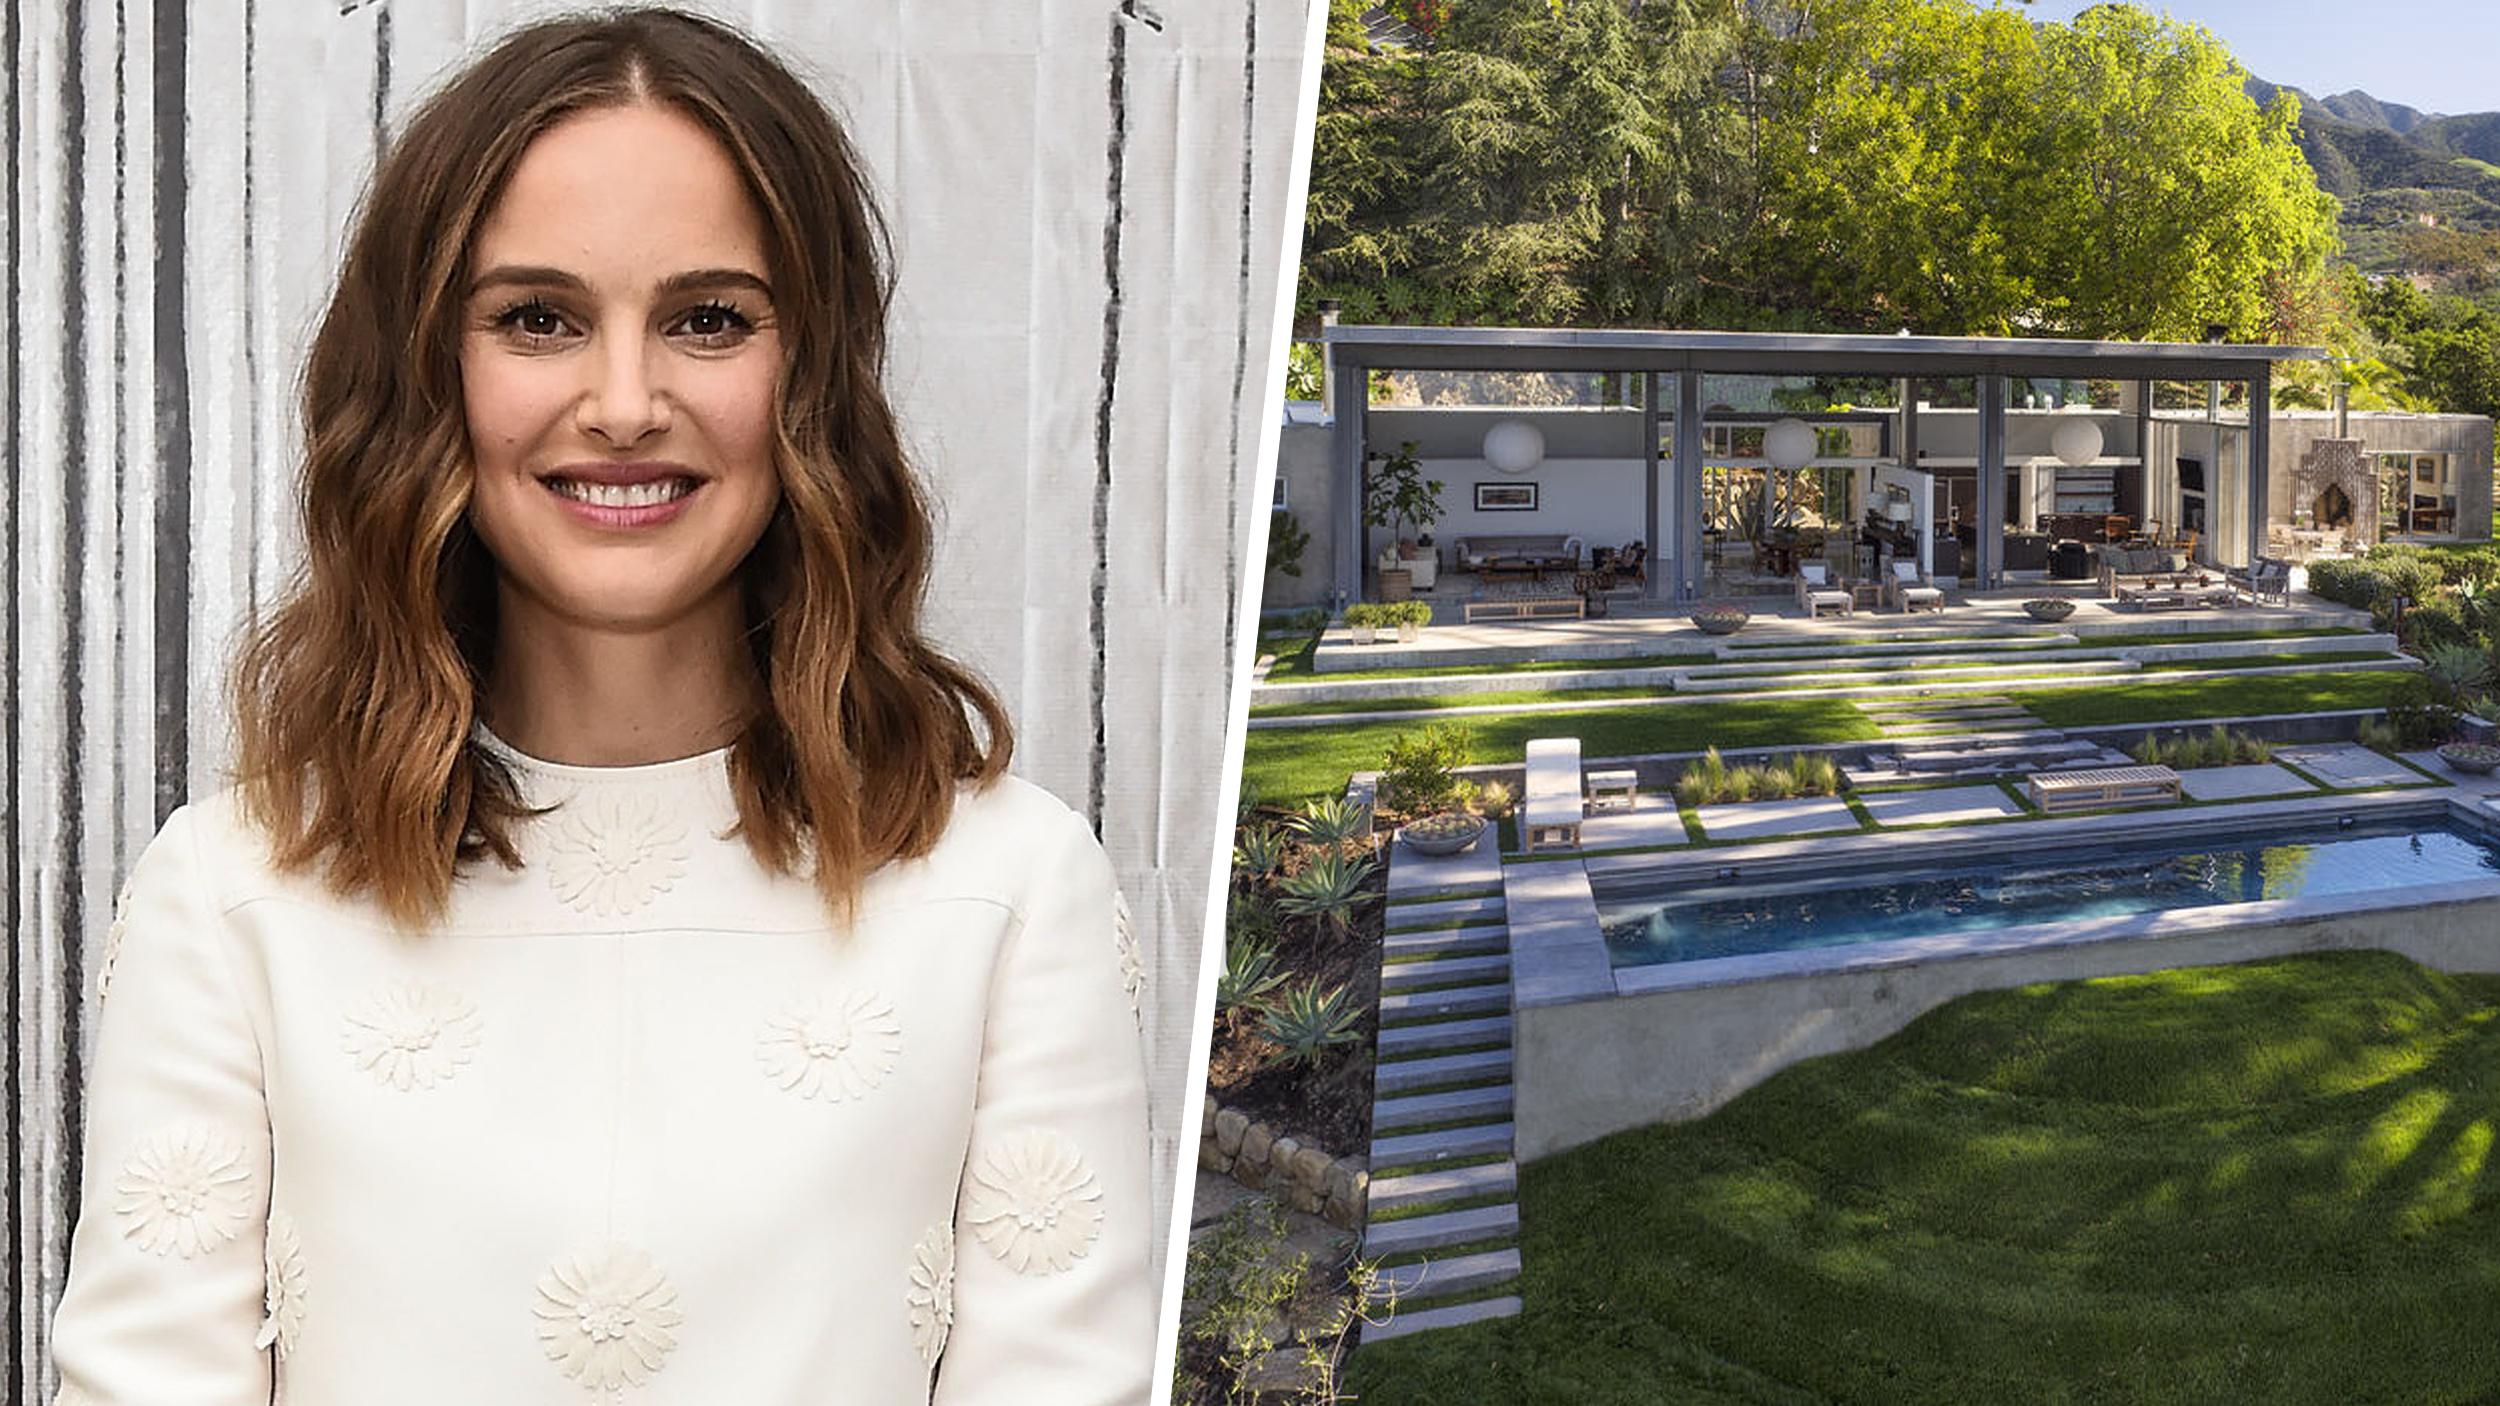 Natalie Portman's vacation home in Montecito, California ...